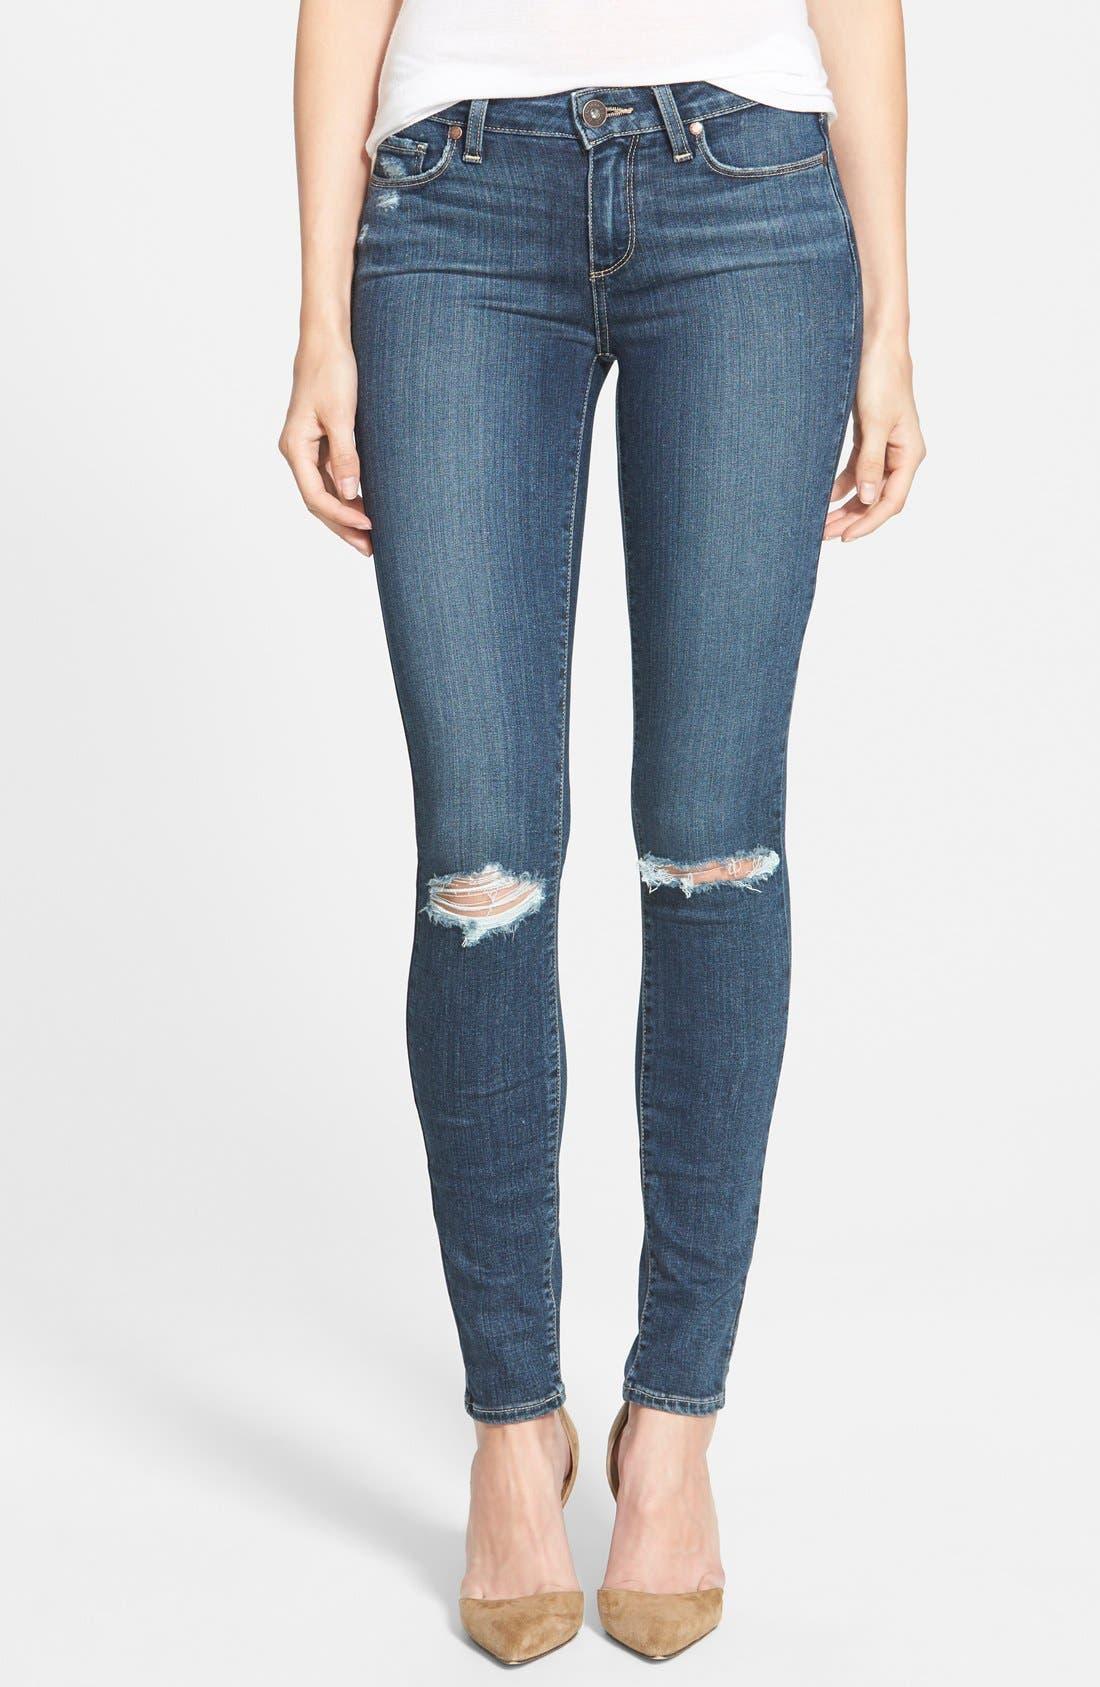 Alternate Image 1 Selected - Paige Denim 'Transcend - Verdugo' Ultra Skinny Jeans (Quinnley Destructed)